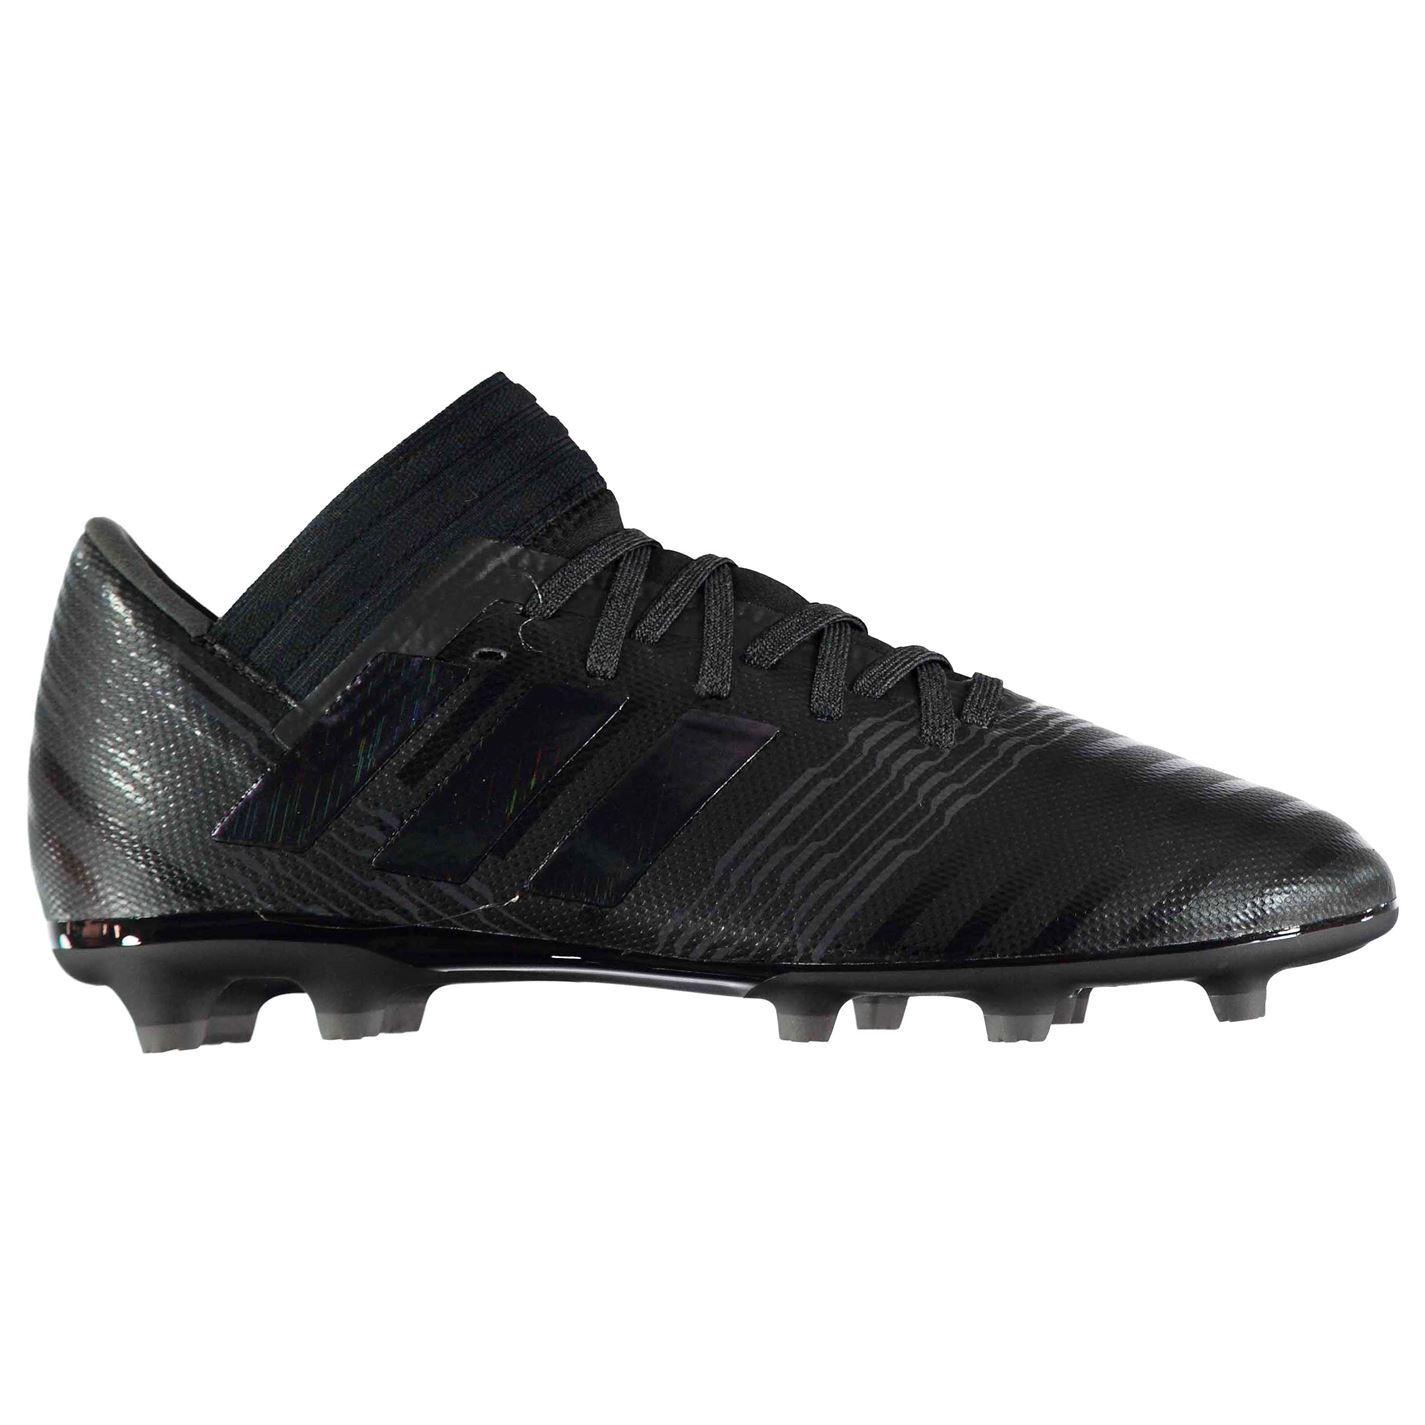 Adidas MESSI 15.1 FG//AG Football Boots Boys Girls Size UK 10 11 1 2 3 4 5 5.5